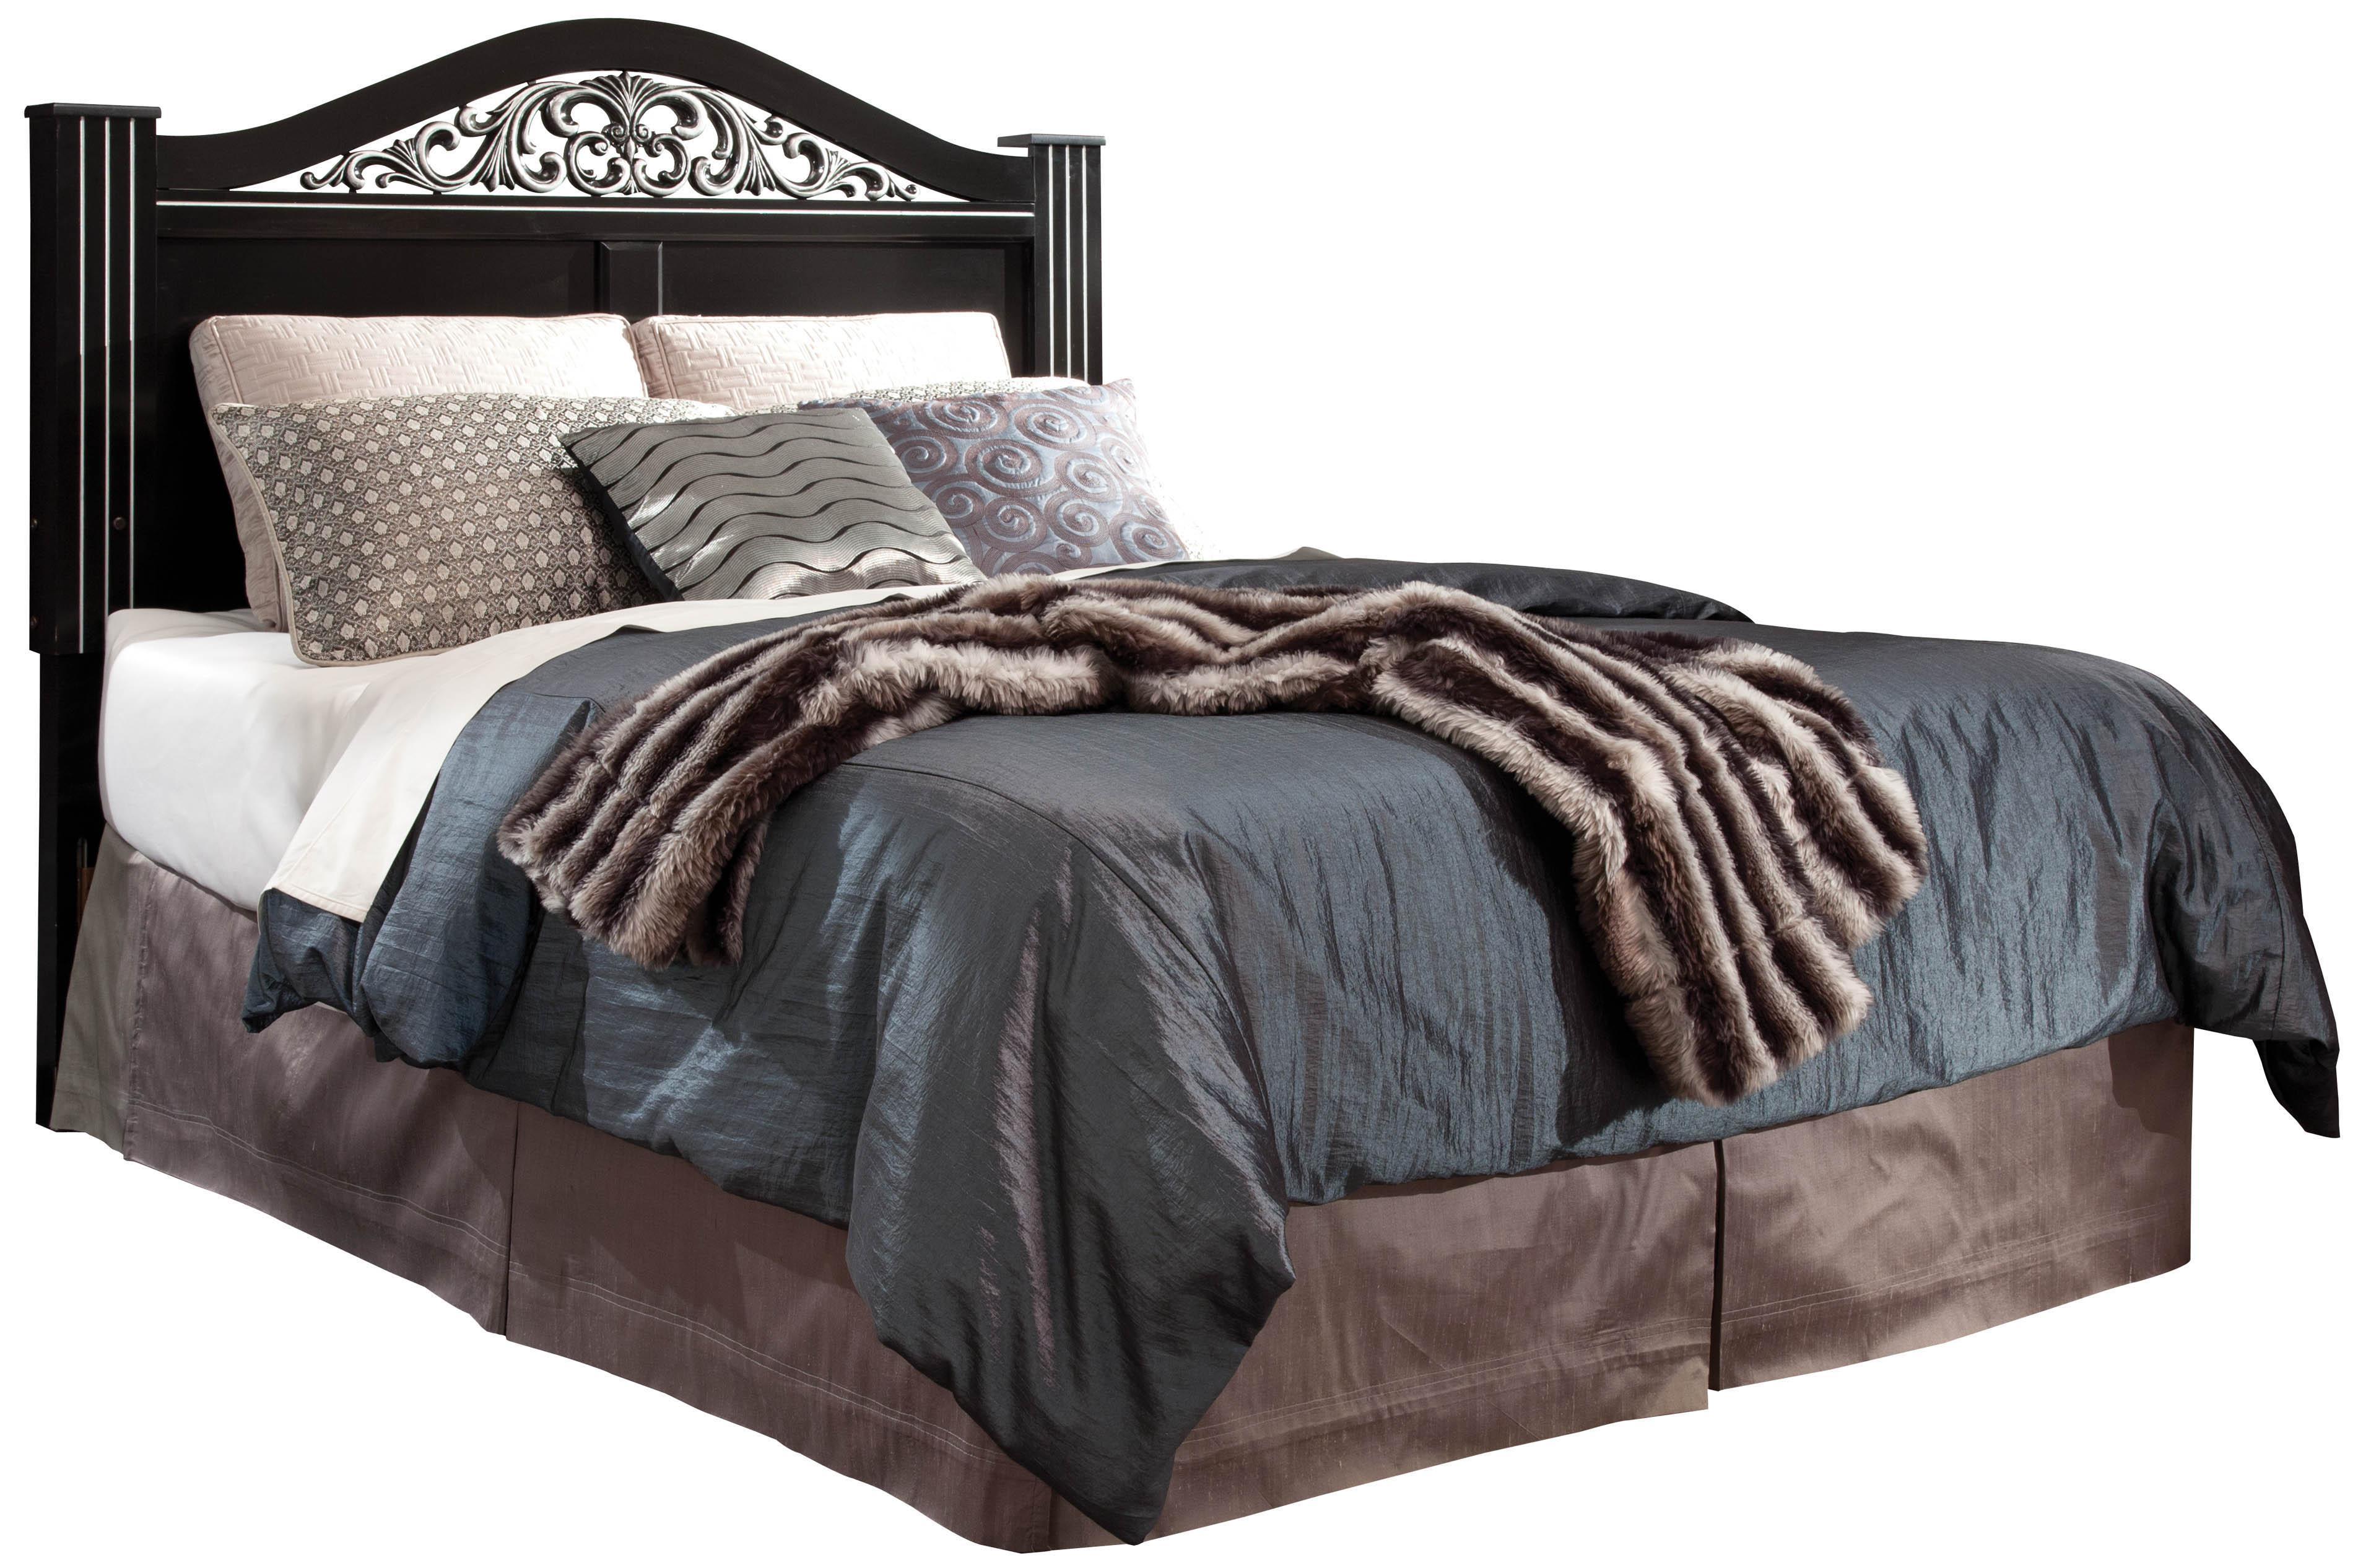 Standard Furniture Odessa Full/Queen Headboard - Item Number: 69552